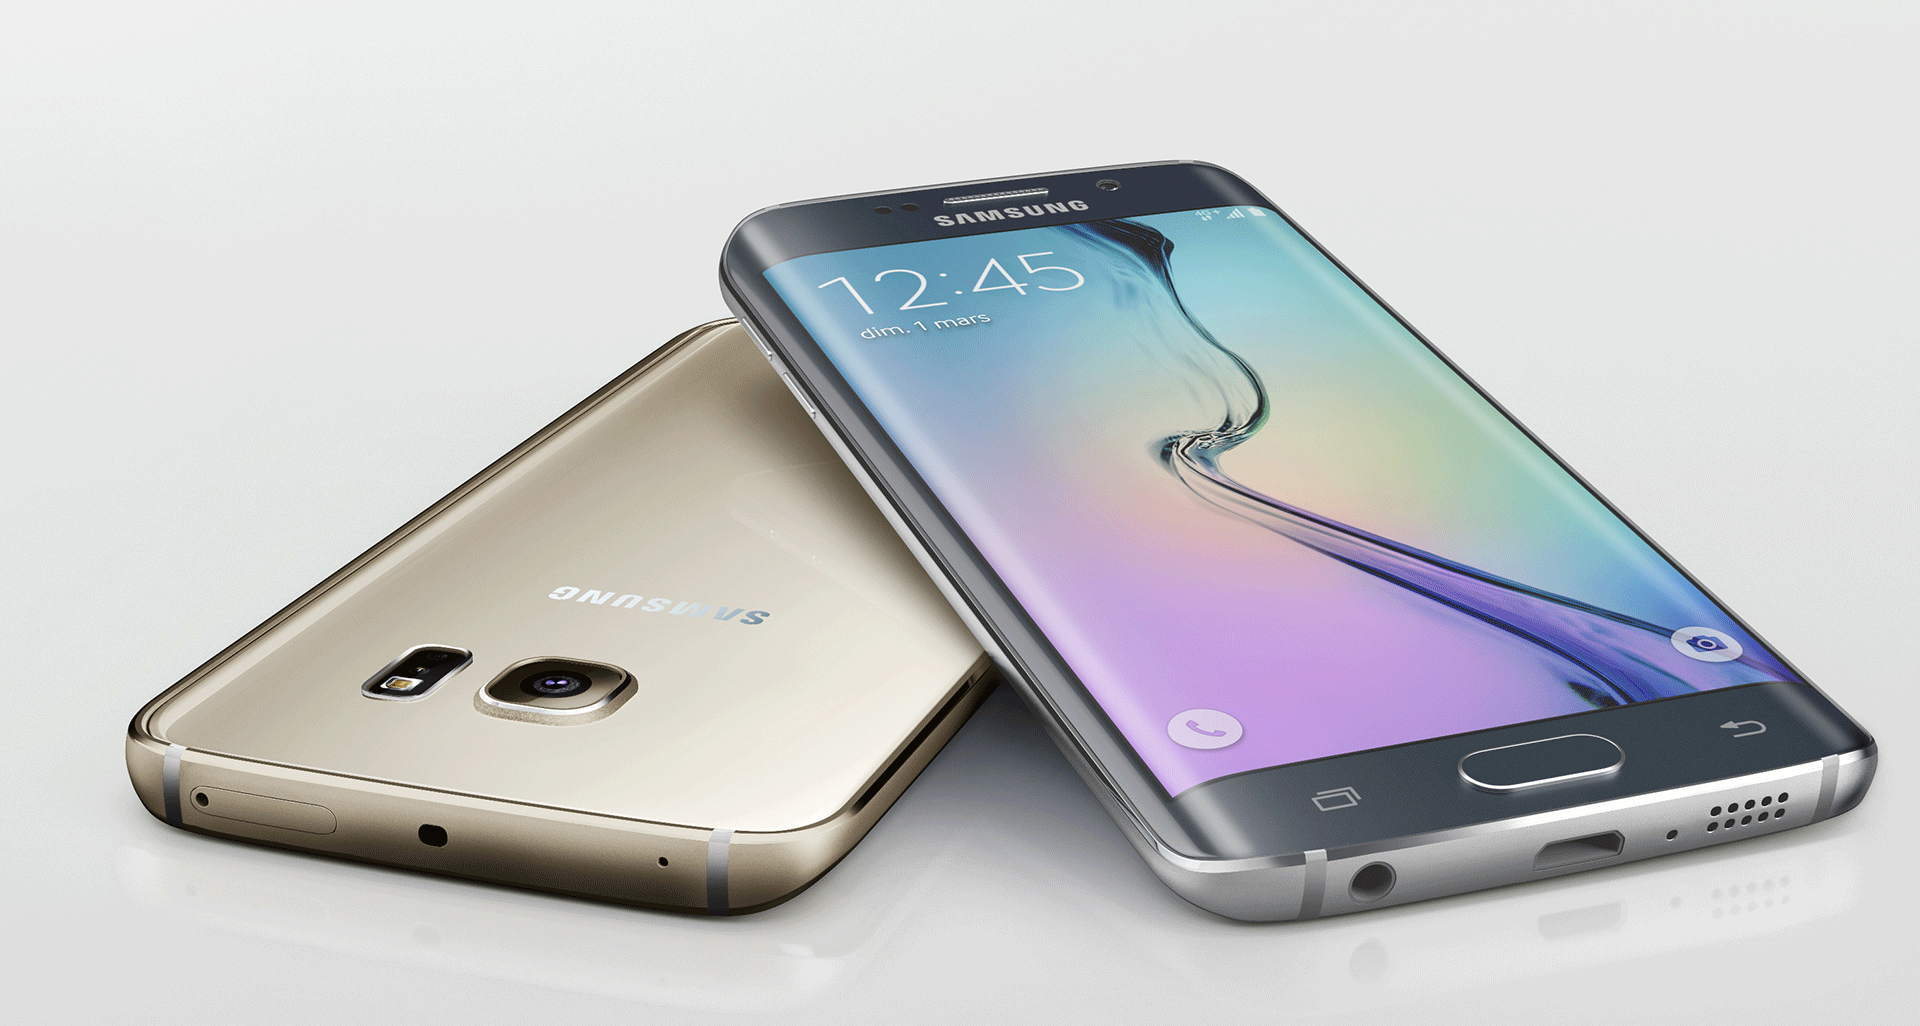 Samsung galaxy s6 edge des soucis avec l 39 cran for Samsung s6 photo ecran